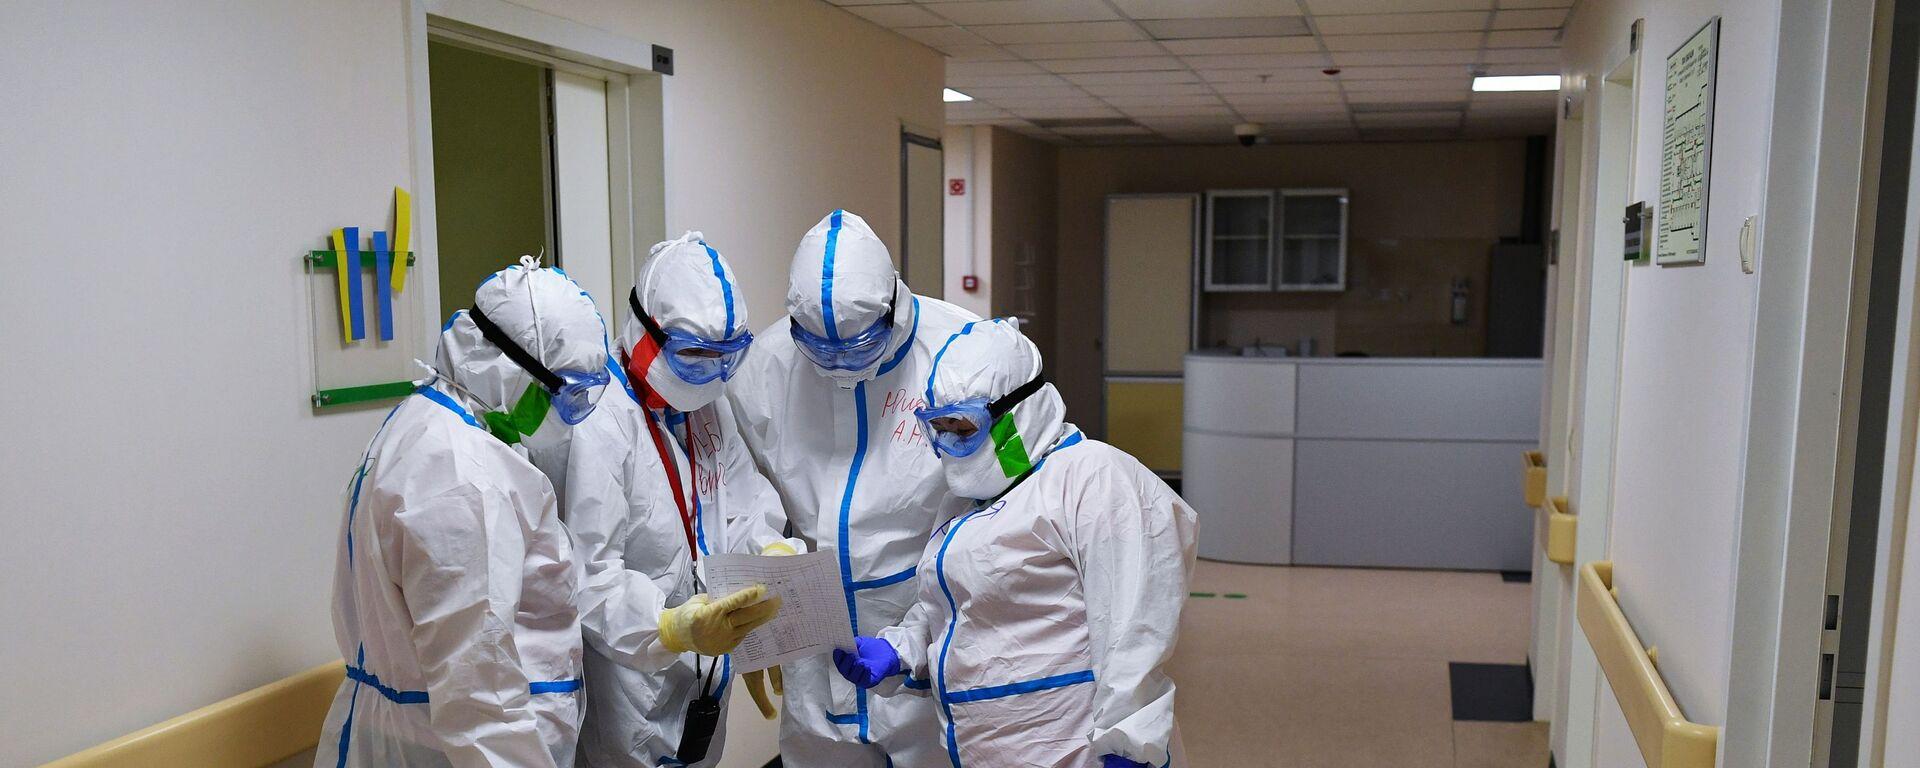 Госпиталь COVID-19 в Центре мозга и нейротехнологий ФМБА России - Sputnik Абхазия, 1920, 10.09.2021